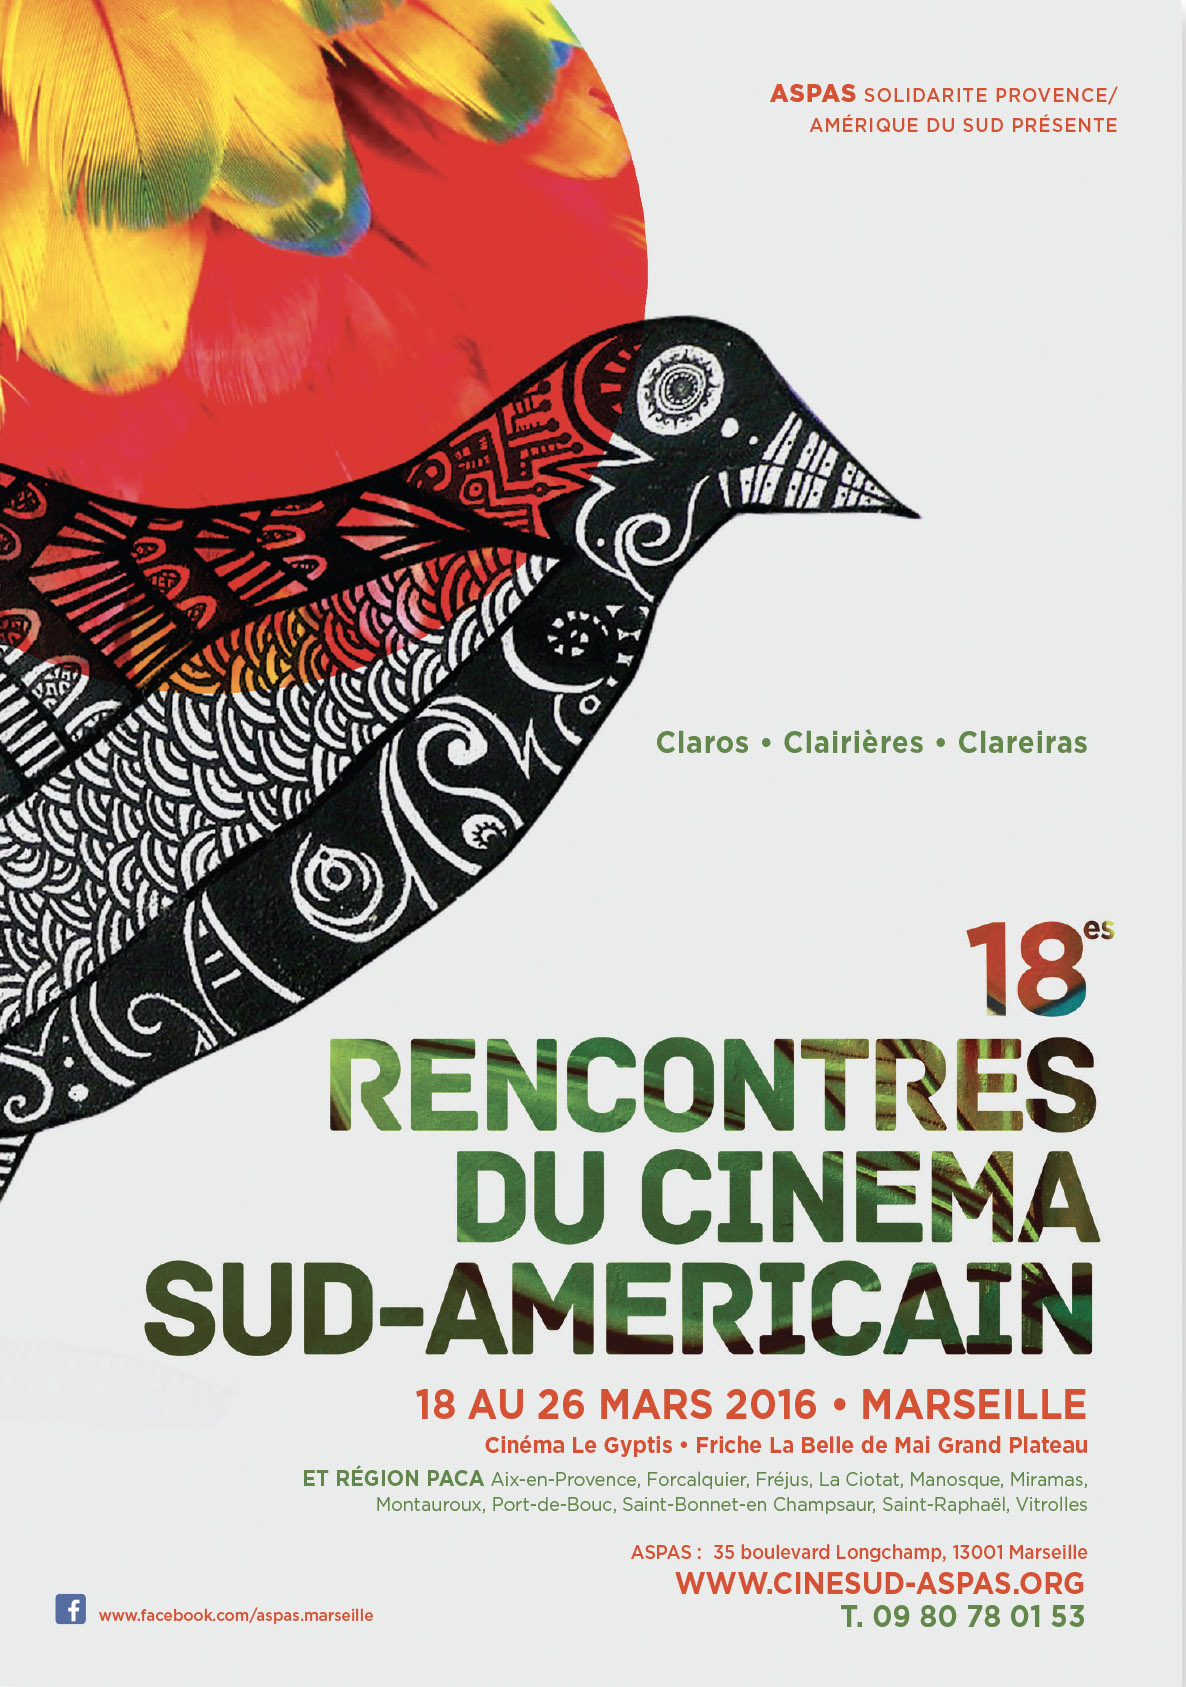 Rencontres du cinema sud-americain de marseille